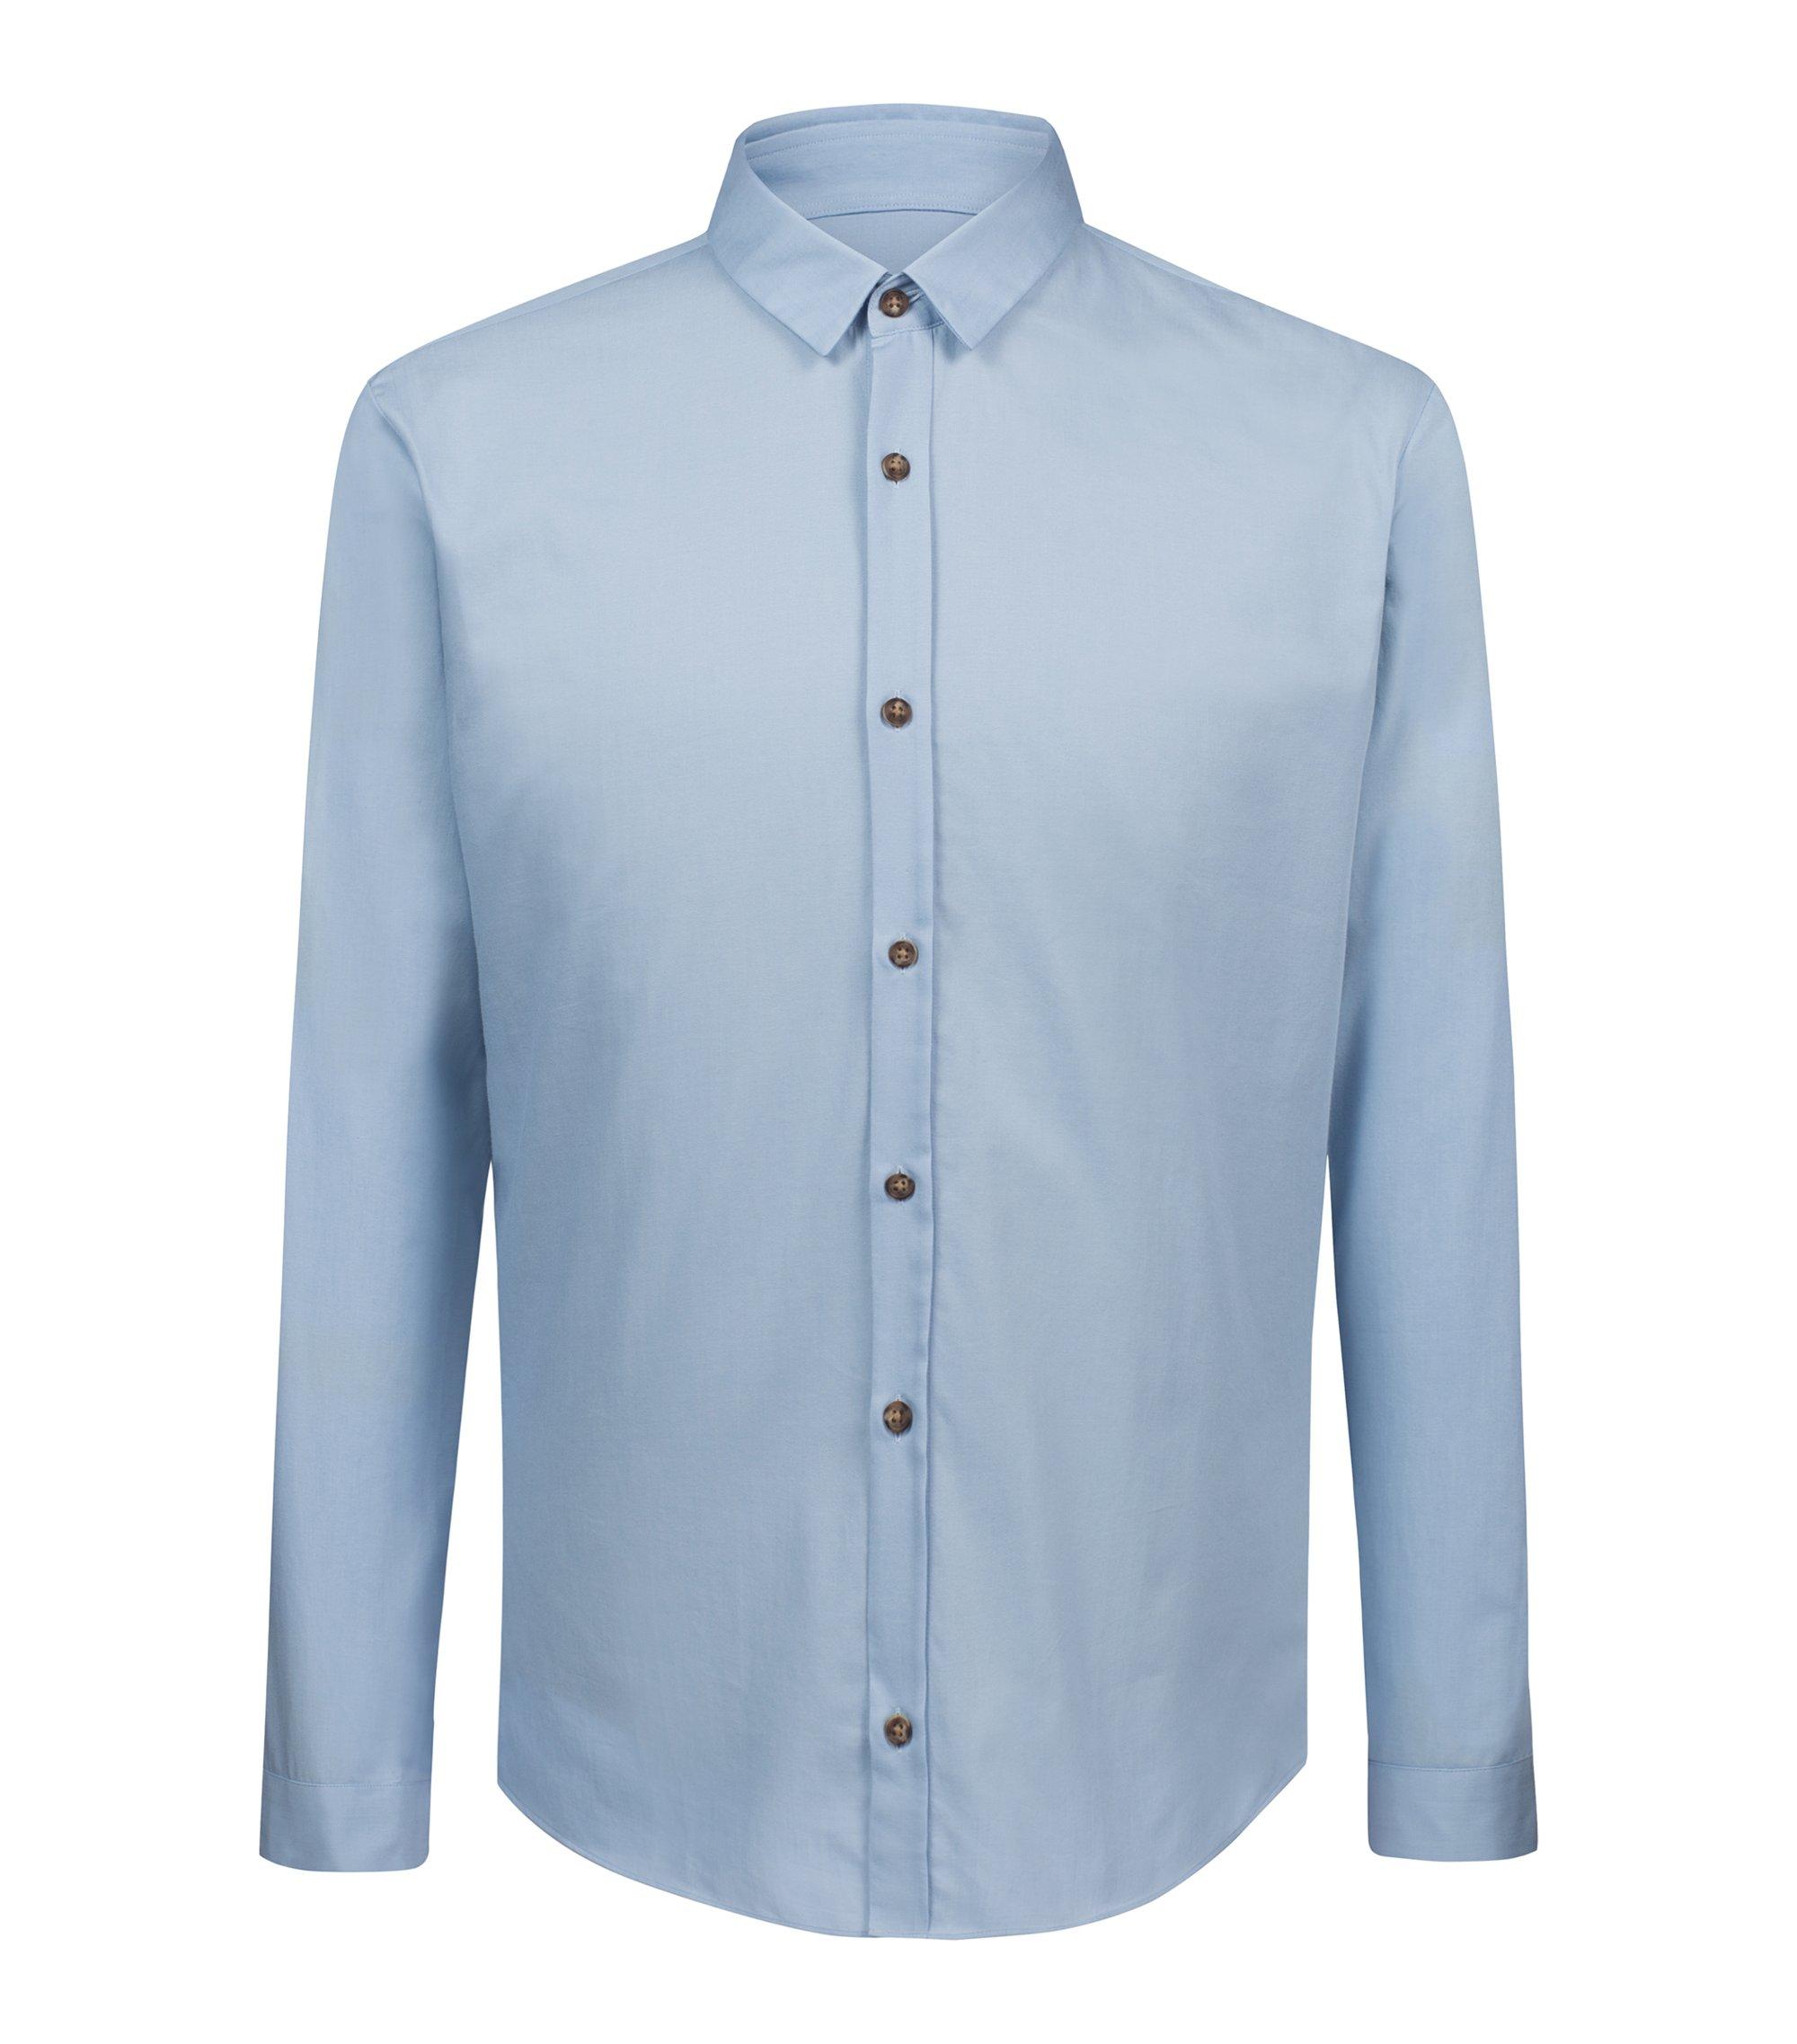 Camicia extra slim fit in cotone stile denim, Celeste